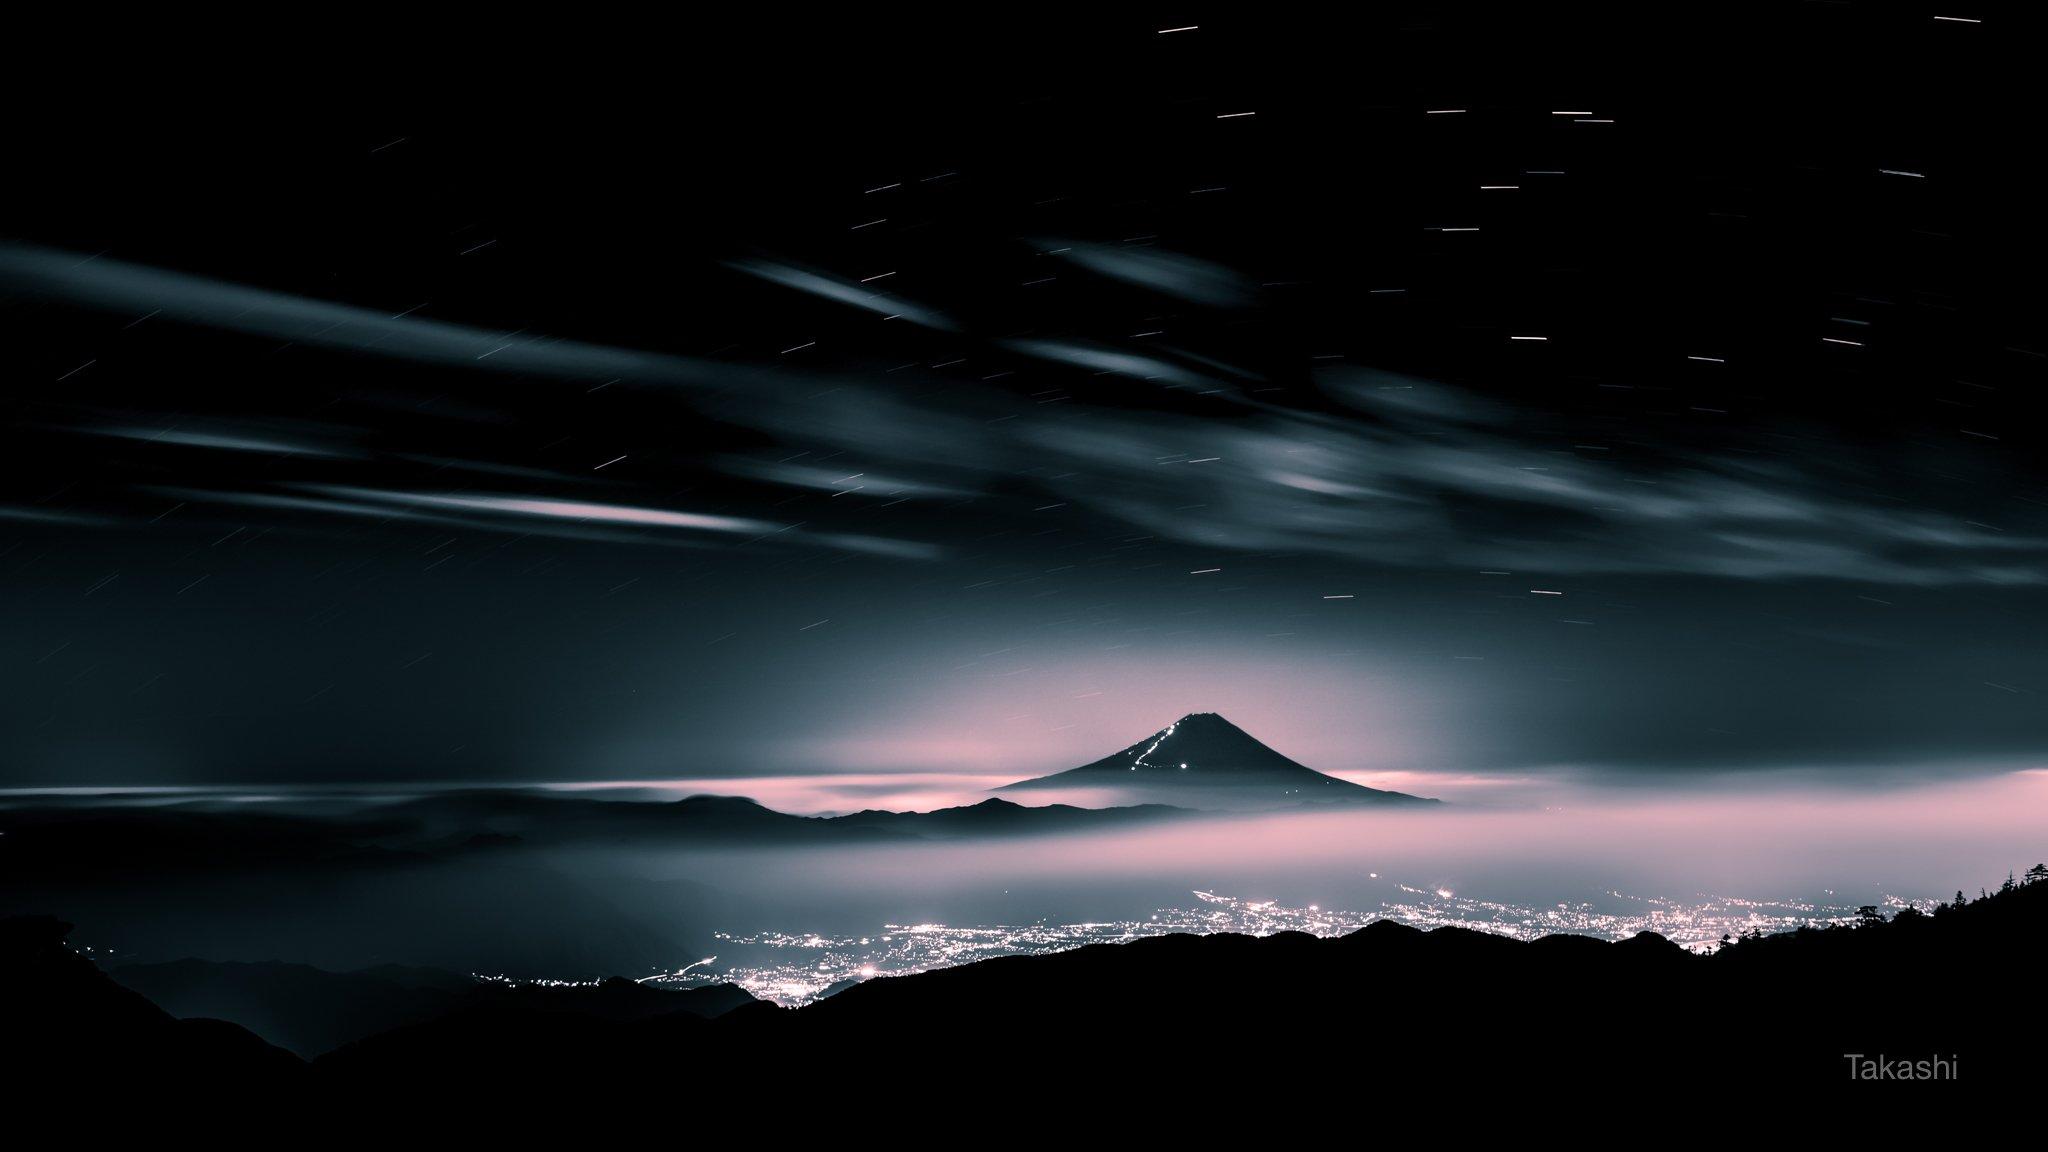 Fuji,Japan,mountain,summer,cloud,night,beautiful,star,light,pink, Takashi